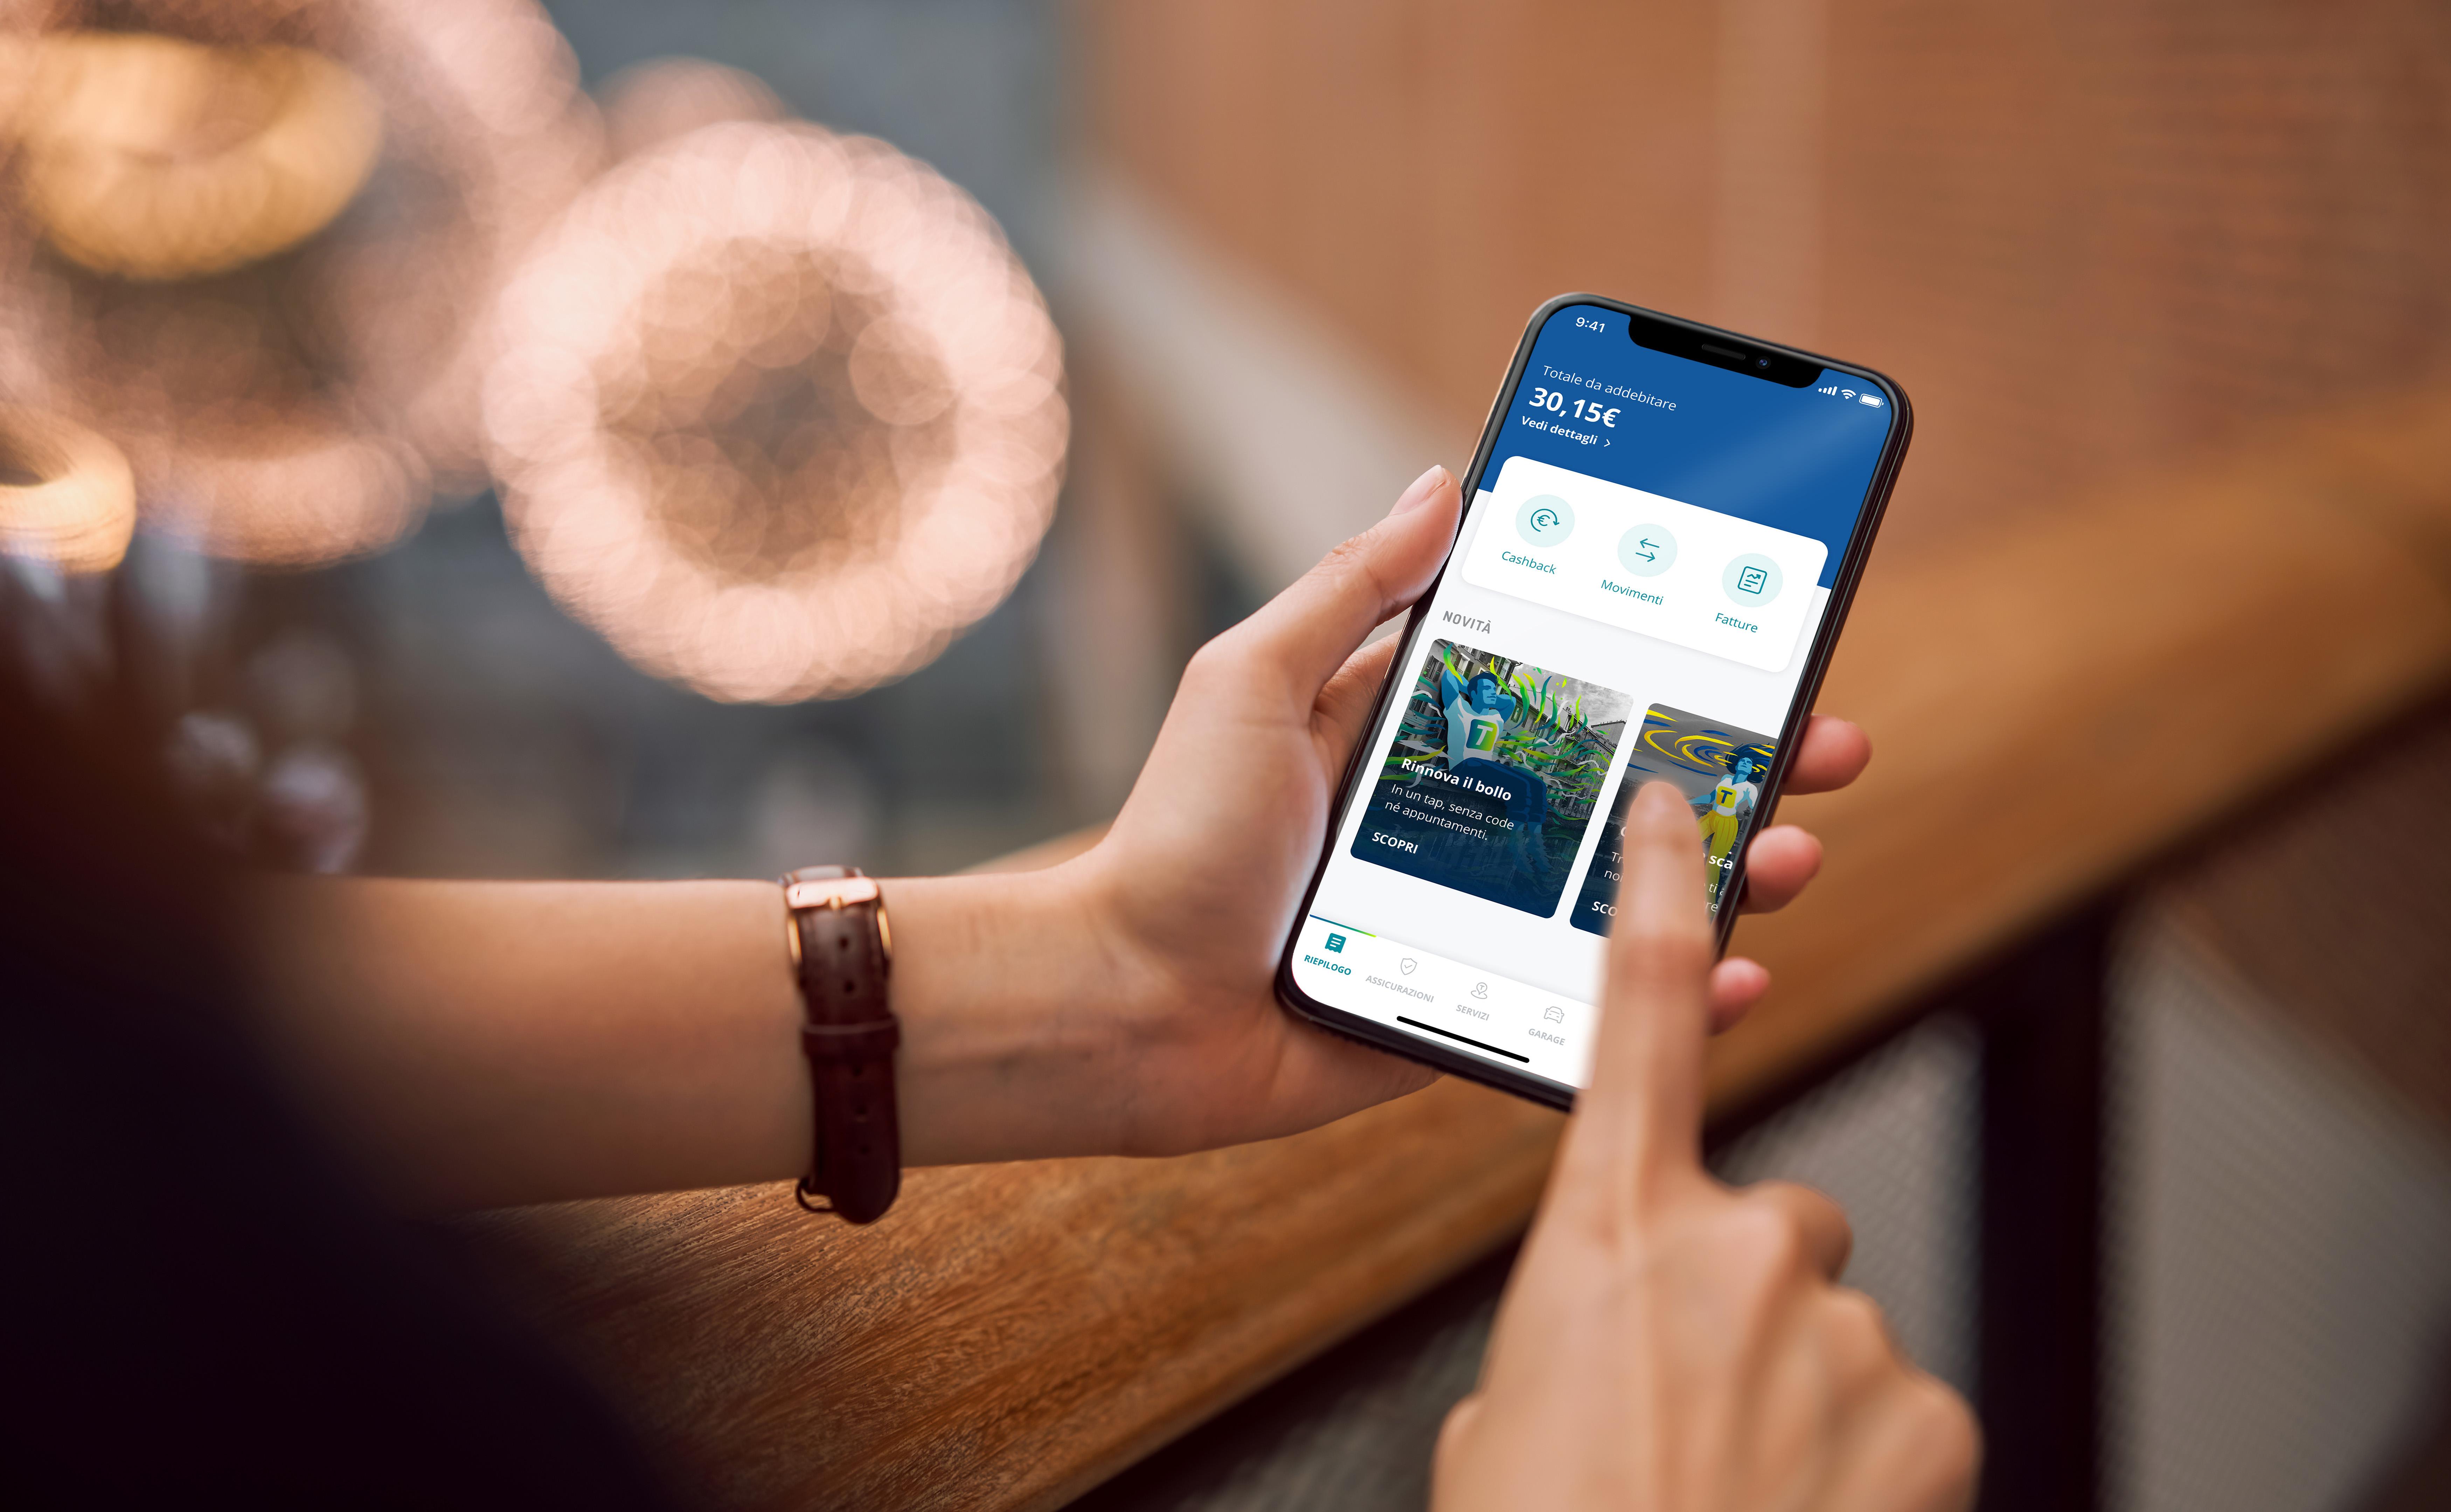 L'App Telepass Pay ti aiuta a ridurre l'inquinamento, i costi e i consumi